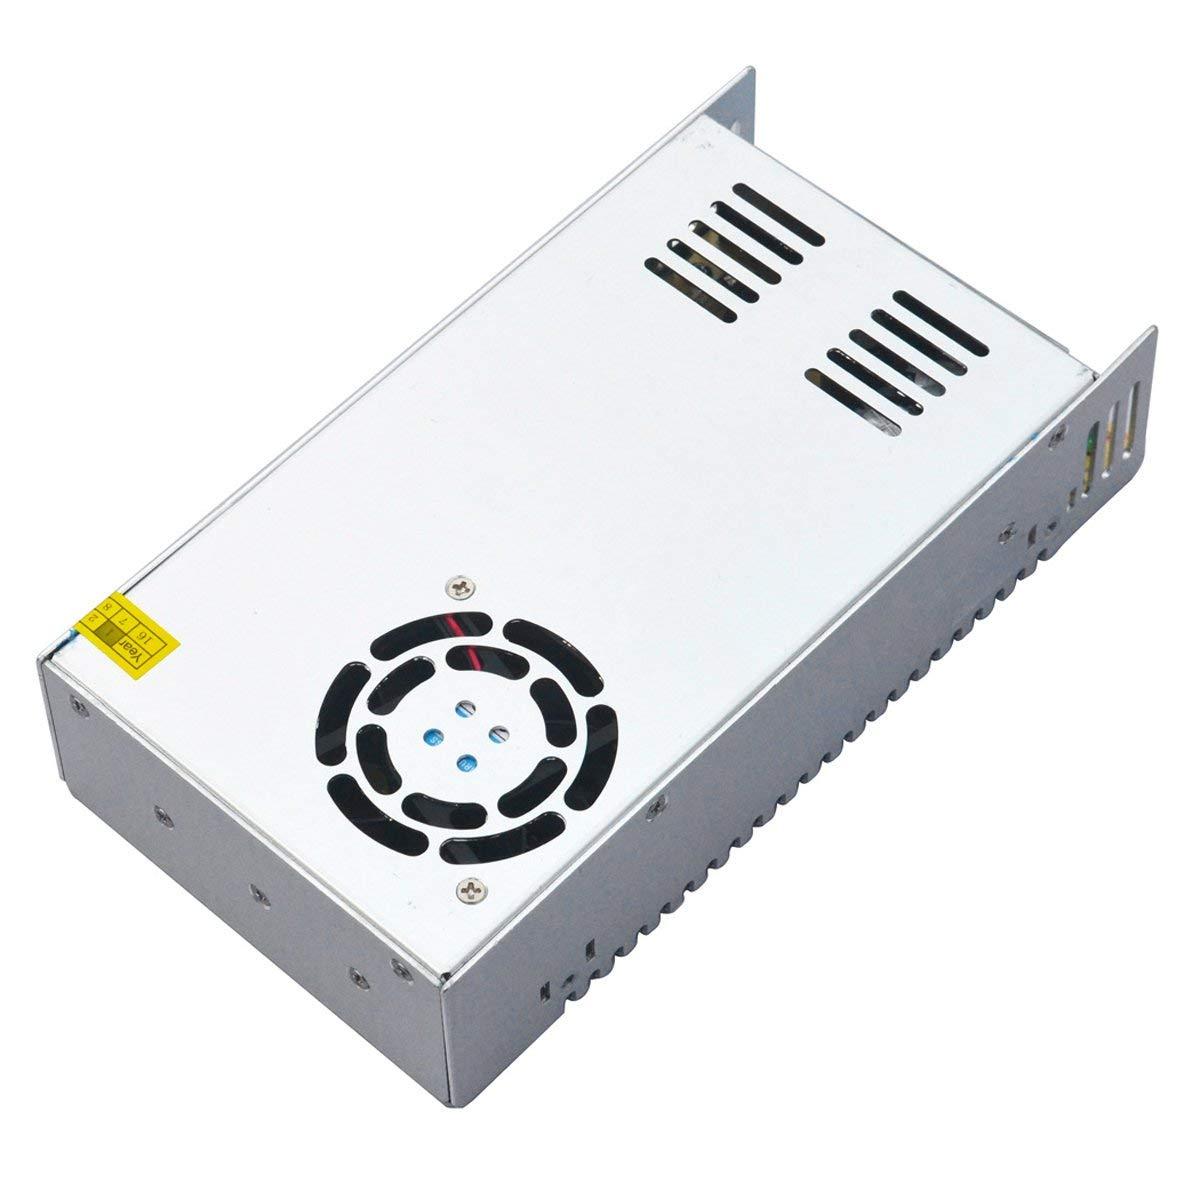 OLSUS 360W AC 110V/220V to DC 24V 15A Aluminum Transformer Switching Power Supply